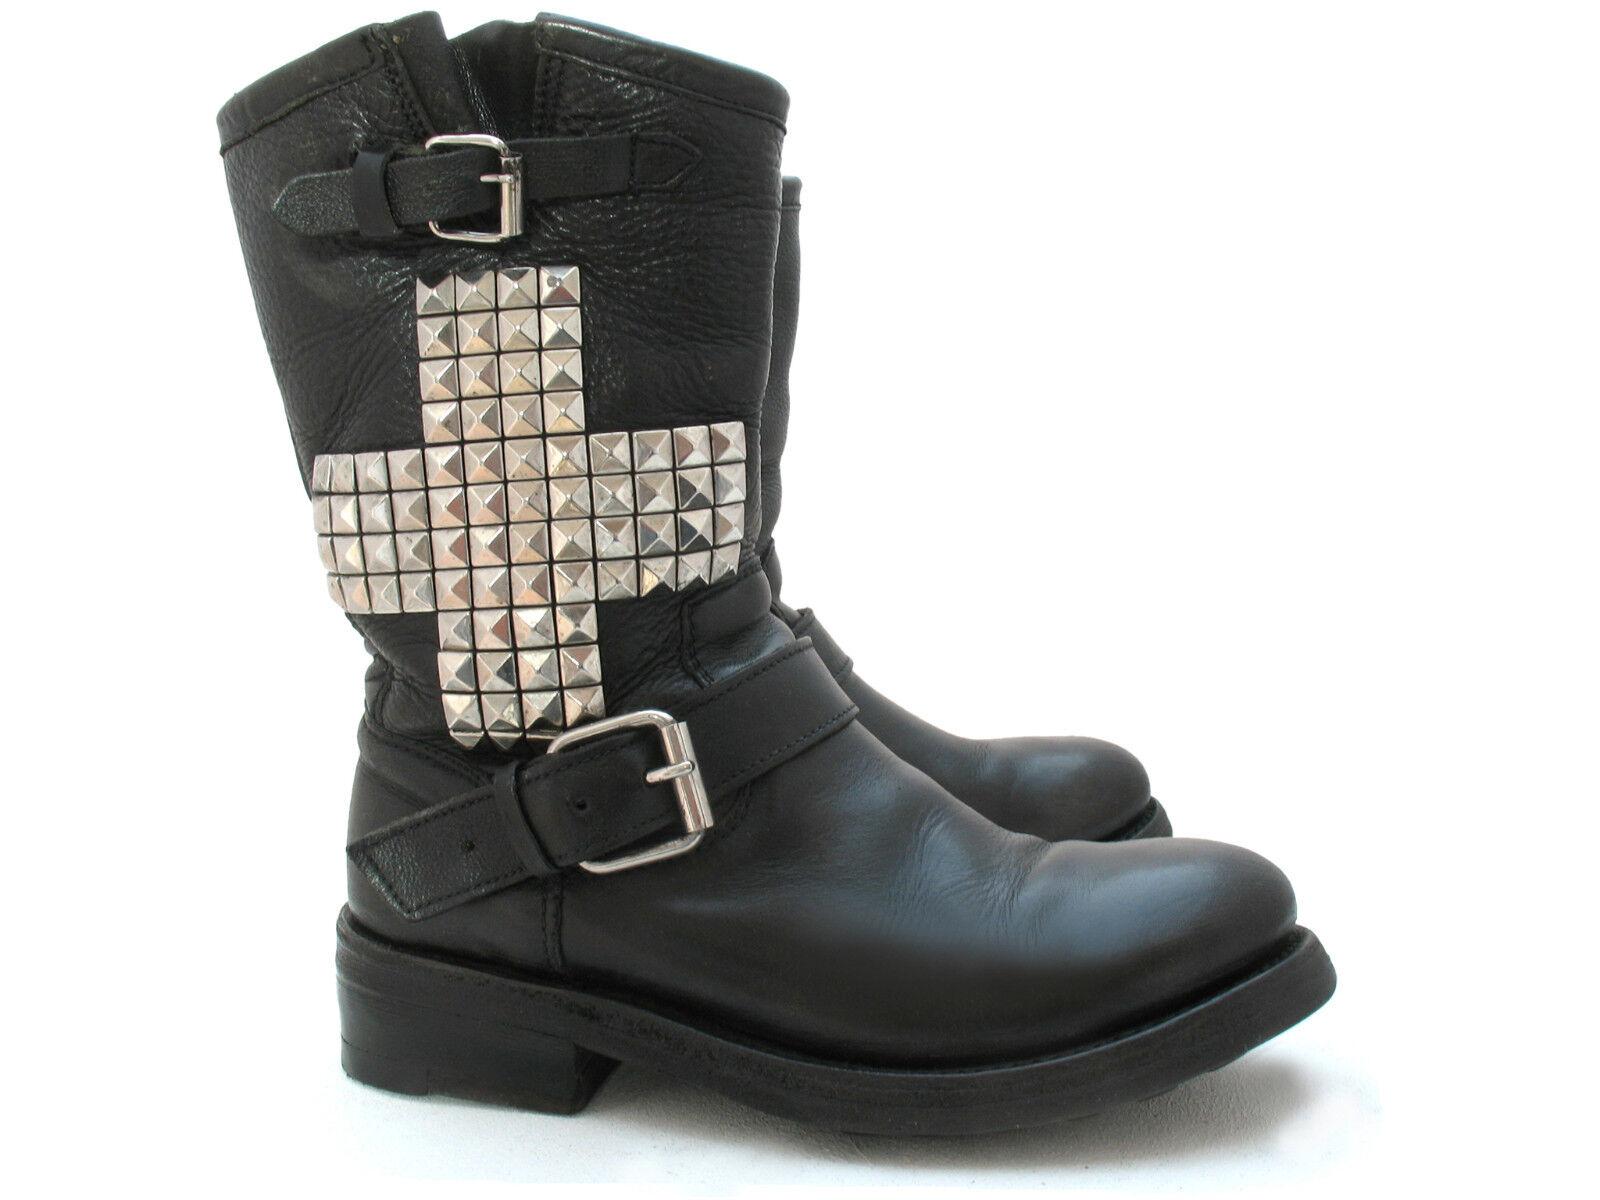 Botas Talla Zapatos Www Ash Nuevos 37 Vumrpa3353 Beg 43RLAj5